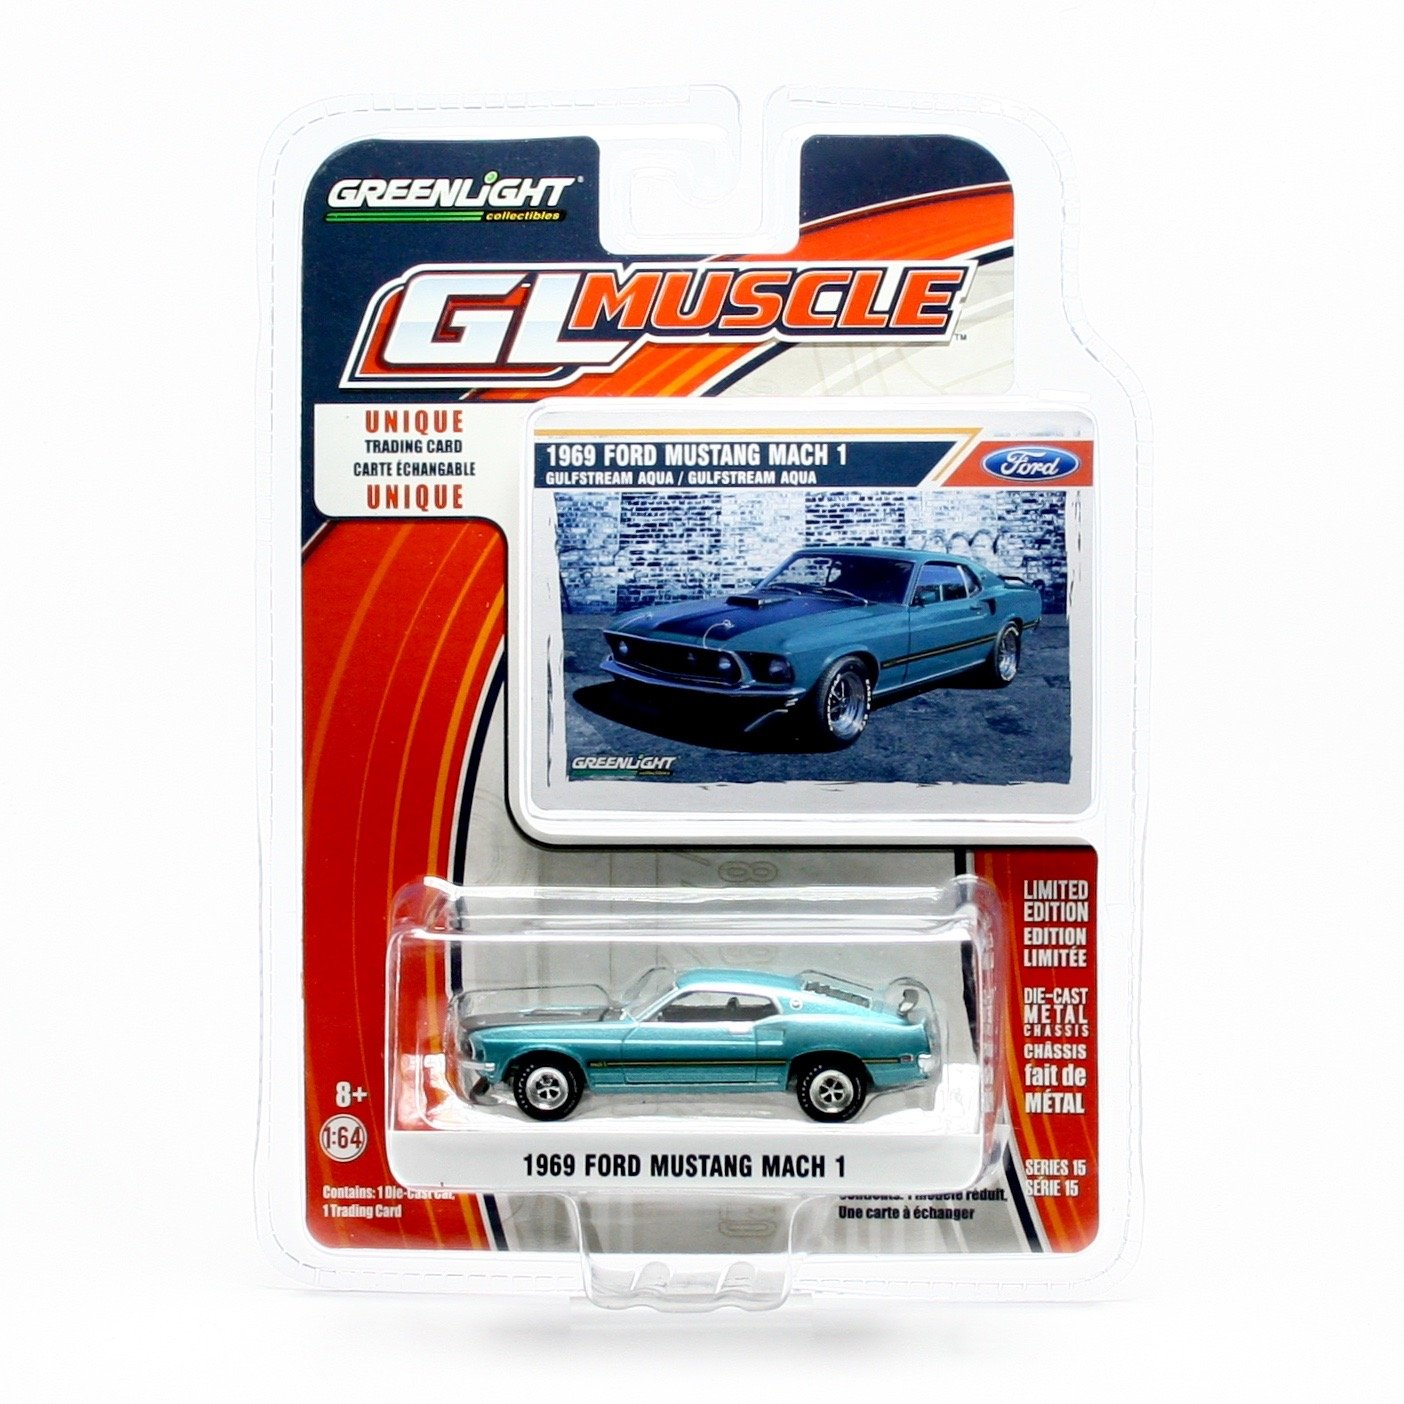 Amazon.com: 1969 FORD MUSTANG MACH 1 (Gulfstream Aqua) * GL Muscle ...